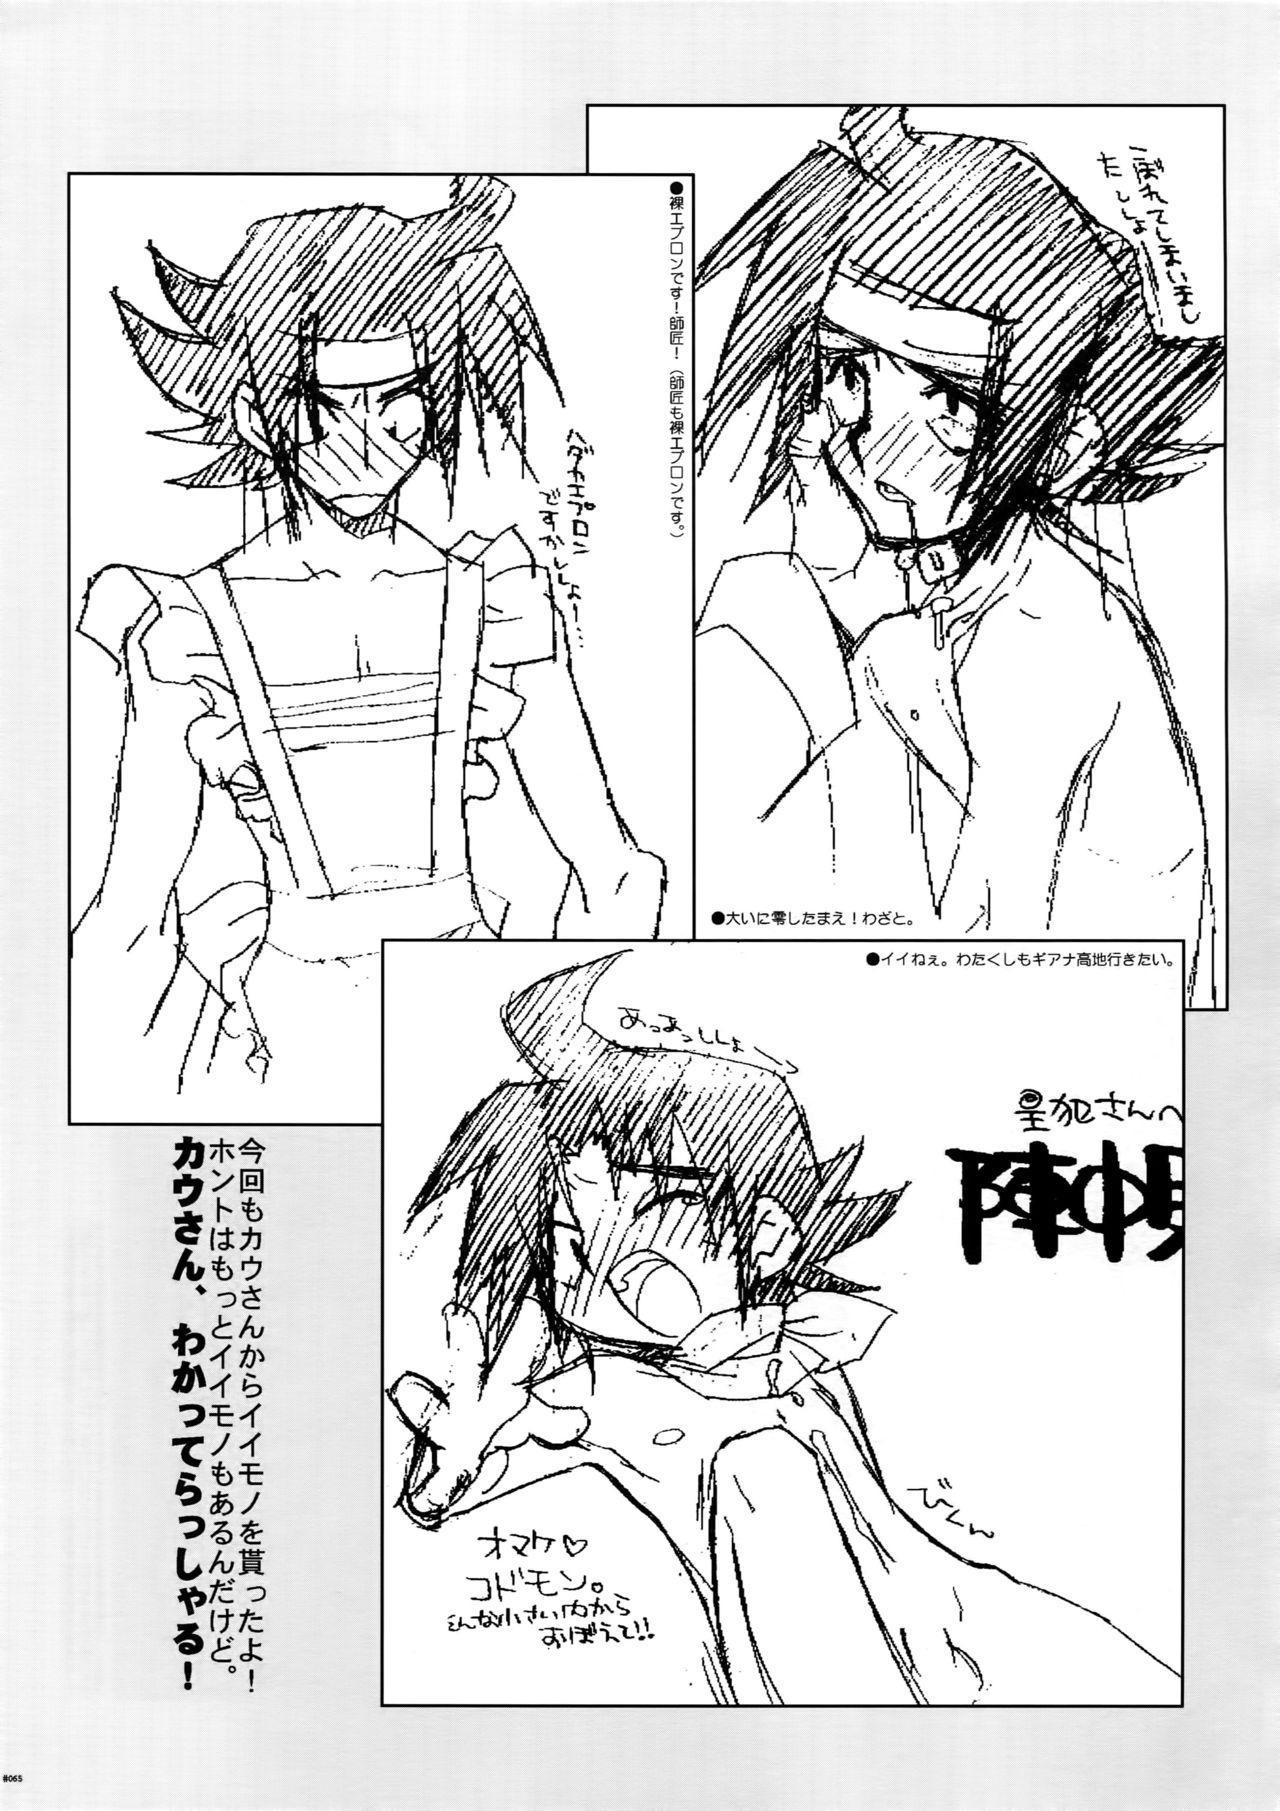 [Article 60 of Criminal Code (Shuhan)] G-gan Josei-Muke Sairoku-Shuu (G Gundam) 64